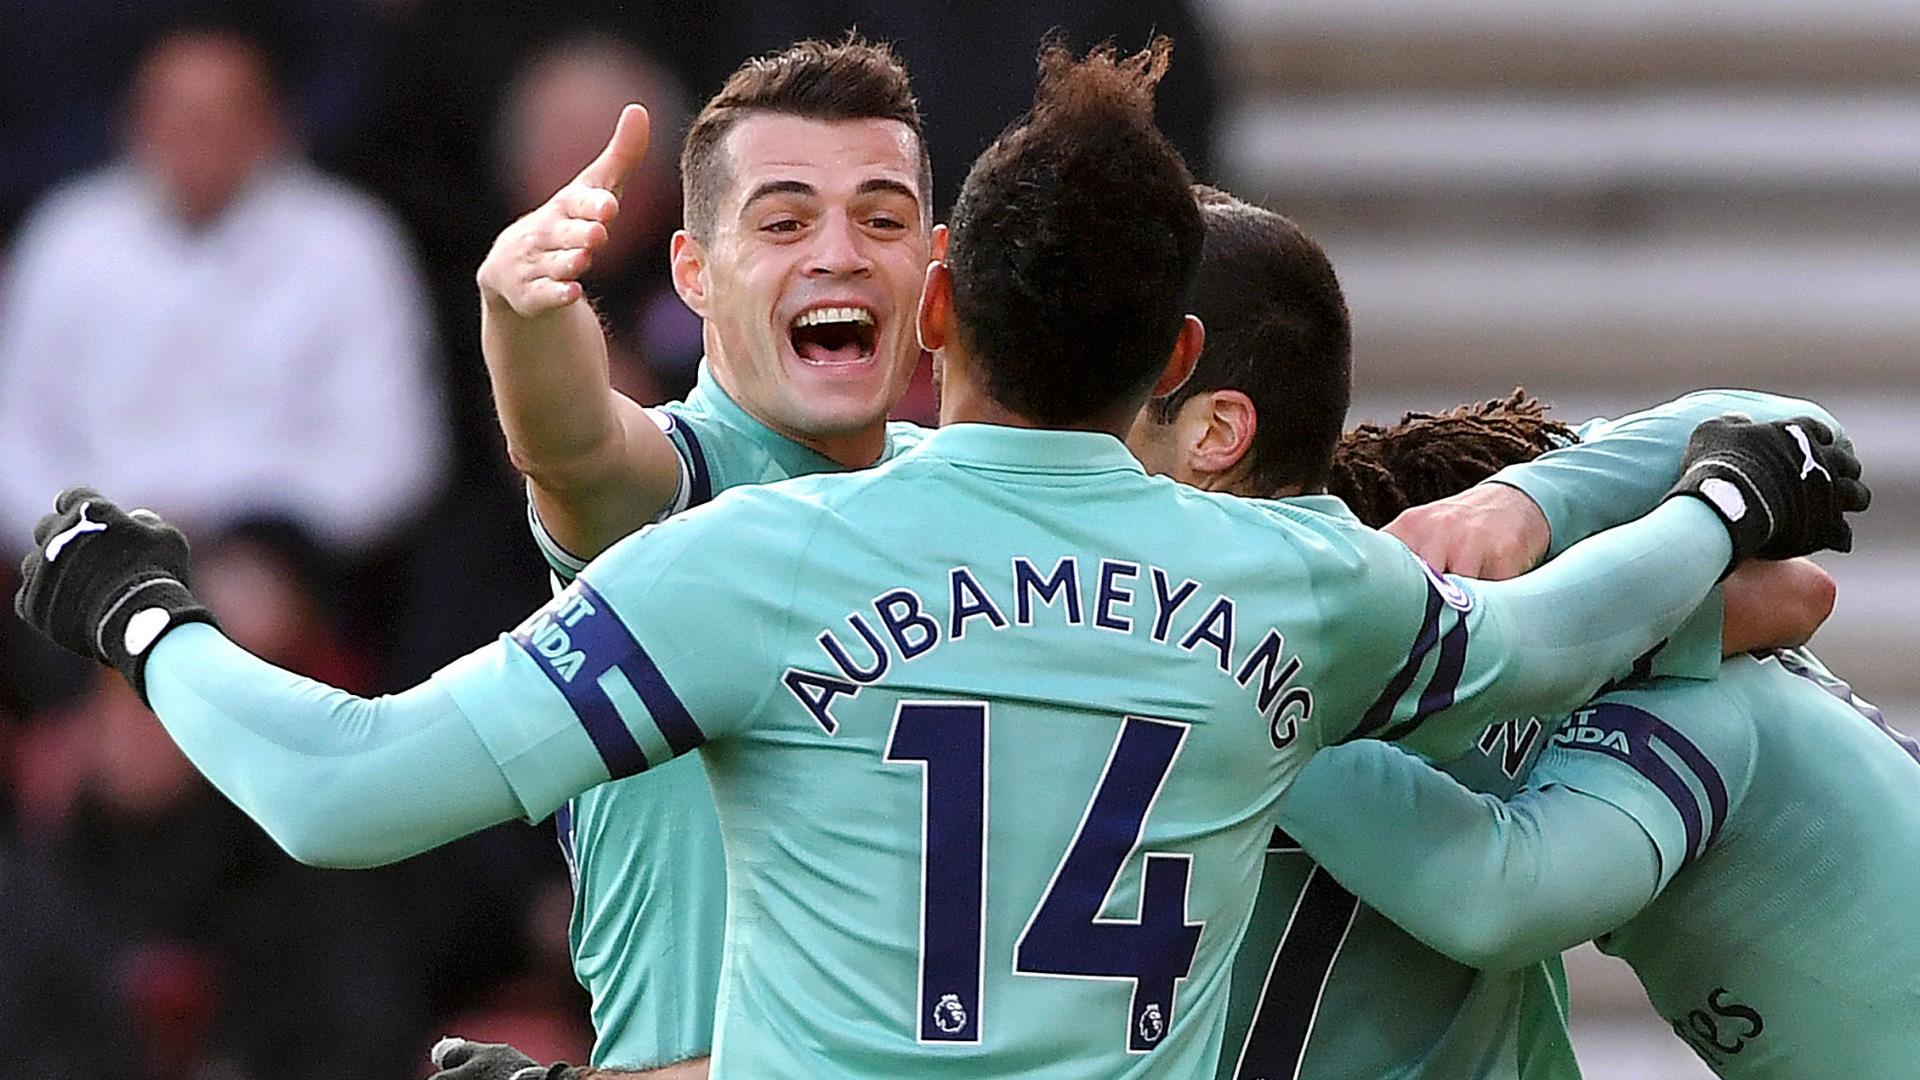 Aubameyang named new Arsenal captain as Xhaka stripped of armband